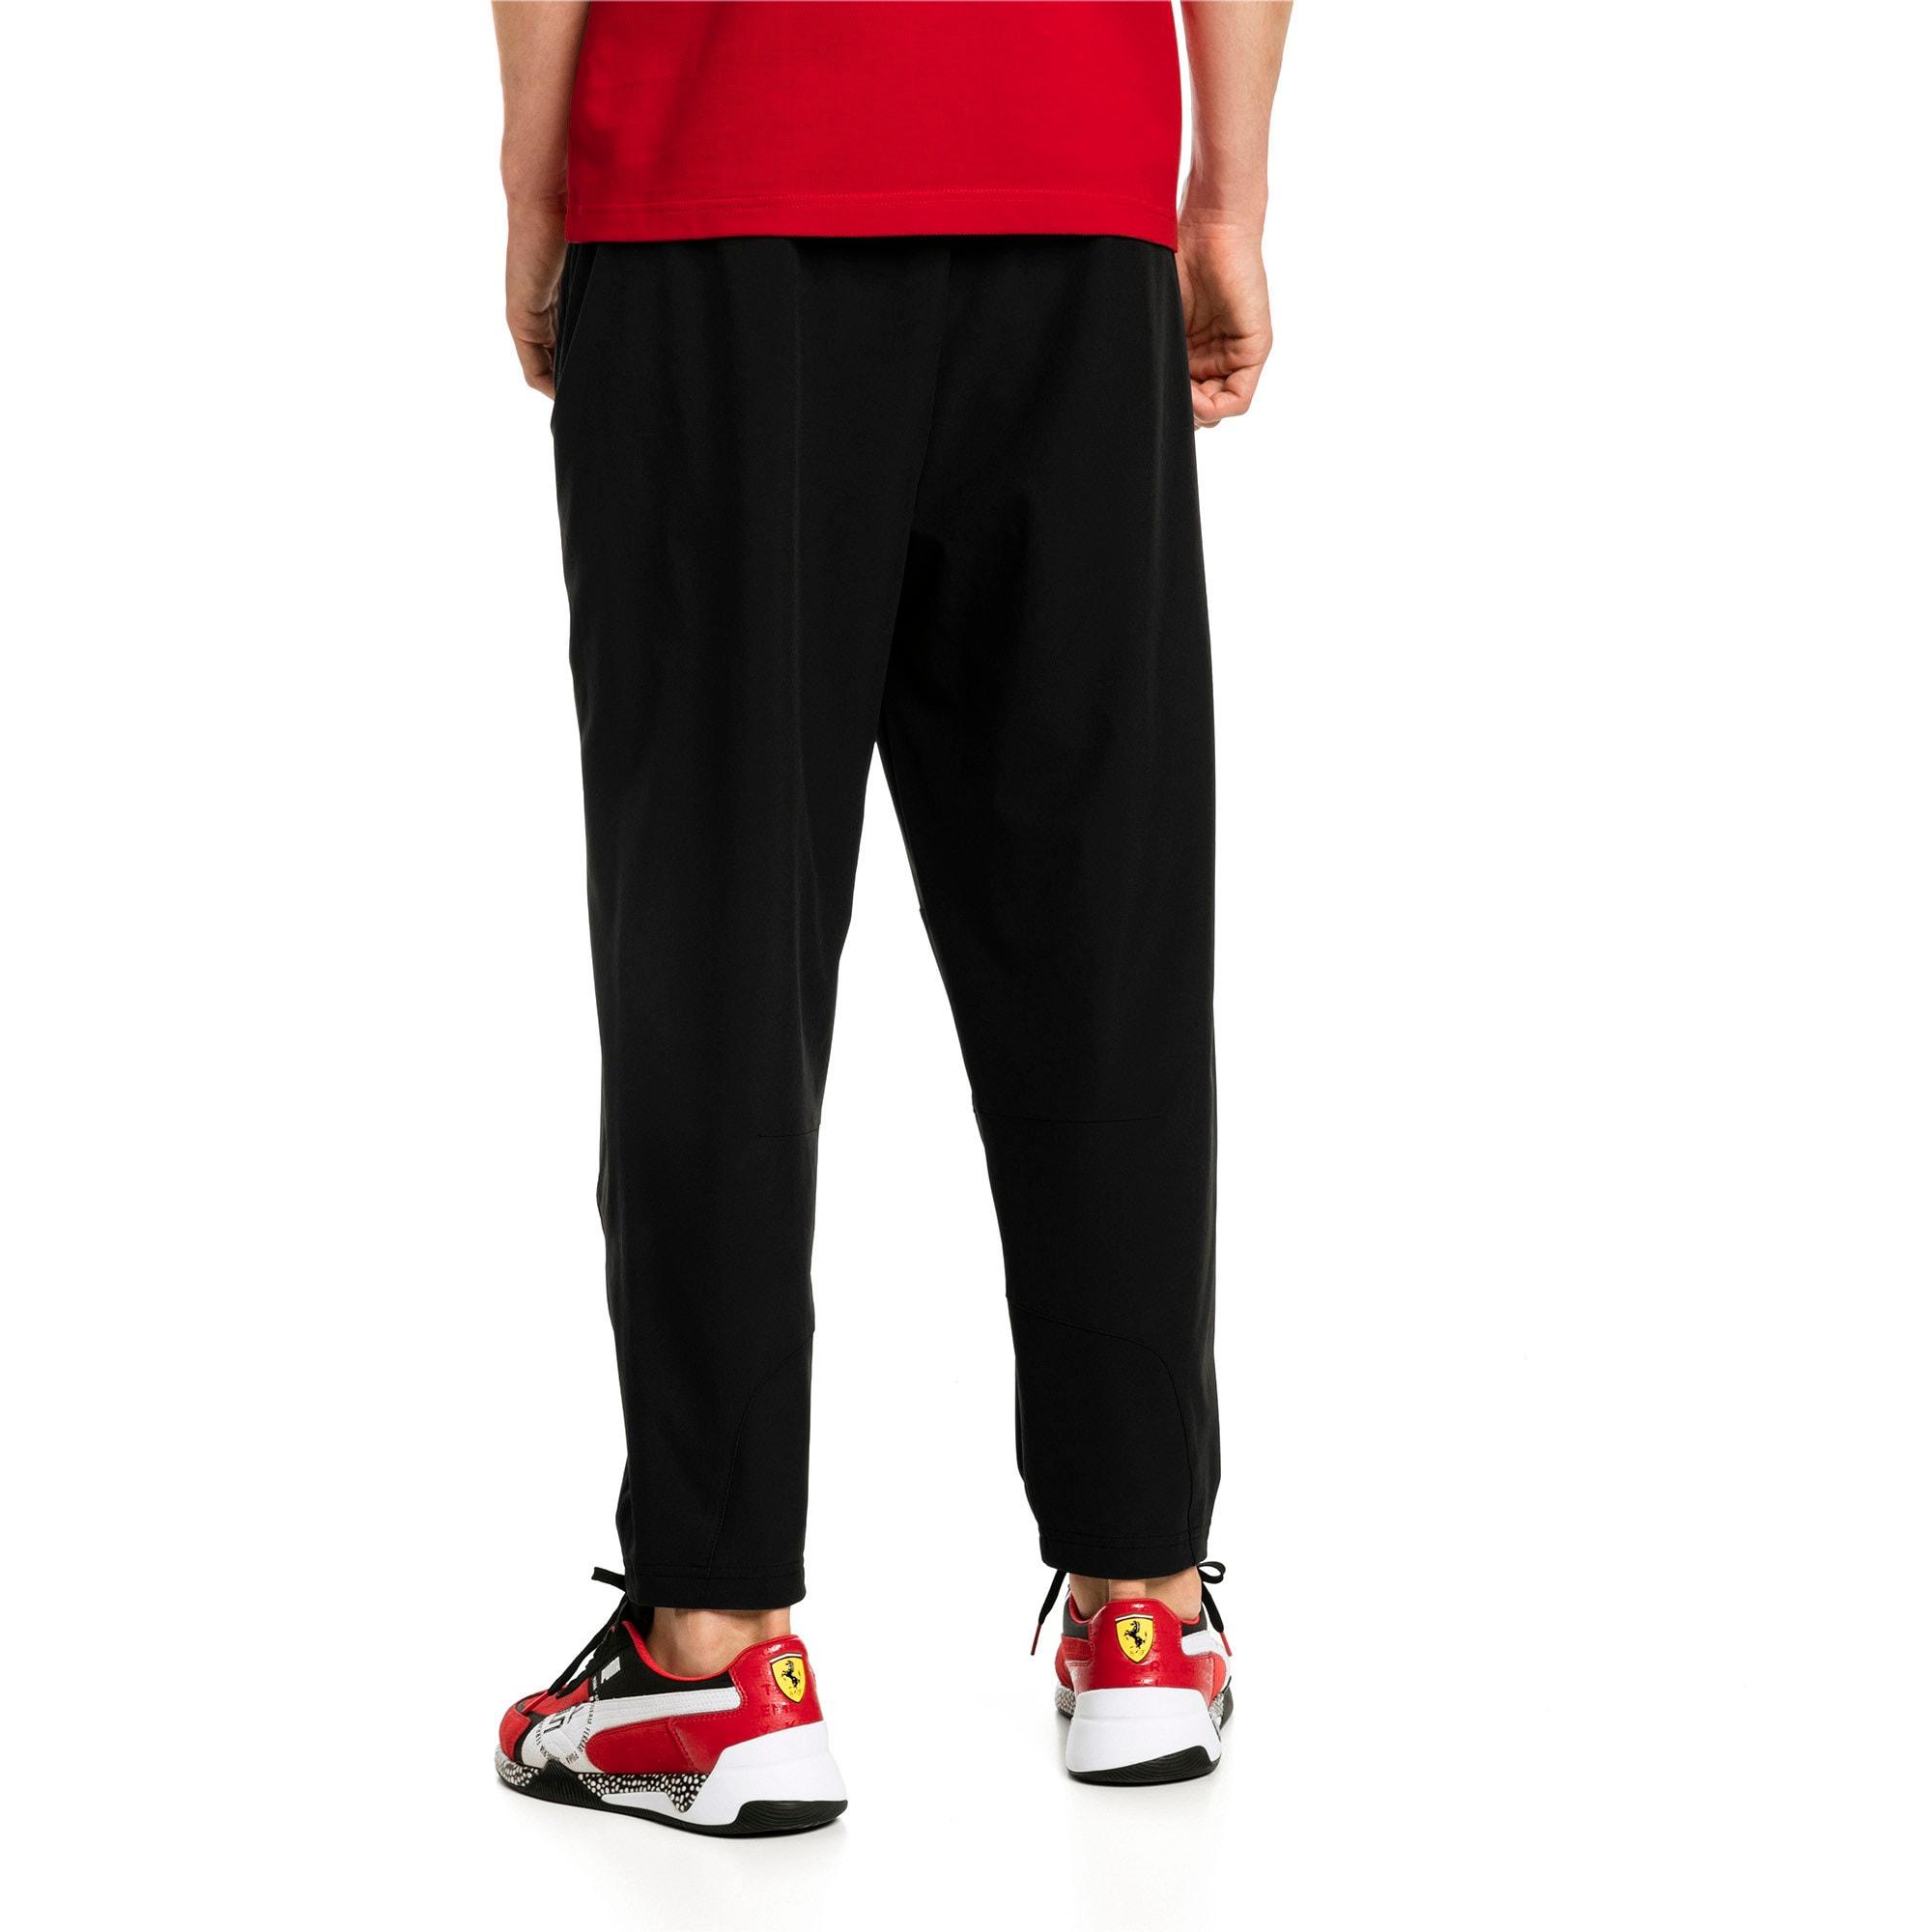 Thumbnail 2 of Scuderia Ferrari Life Men's Sweatpants, Puma Black, medium